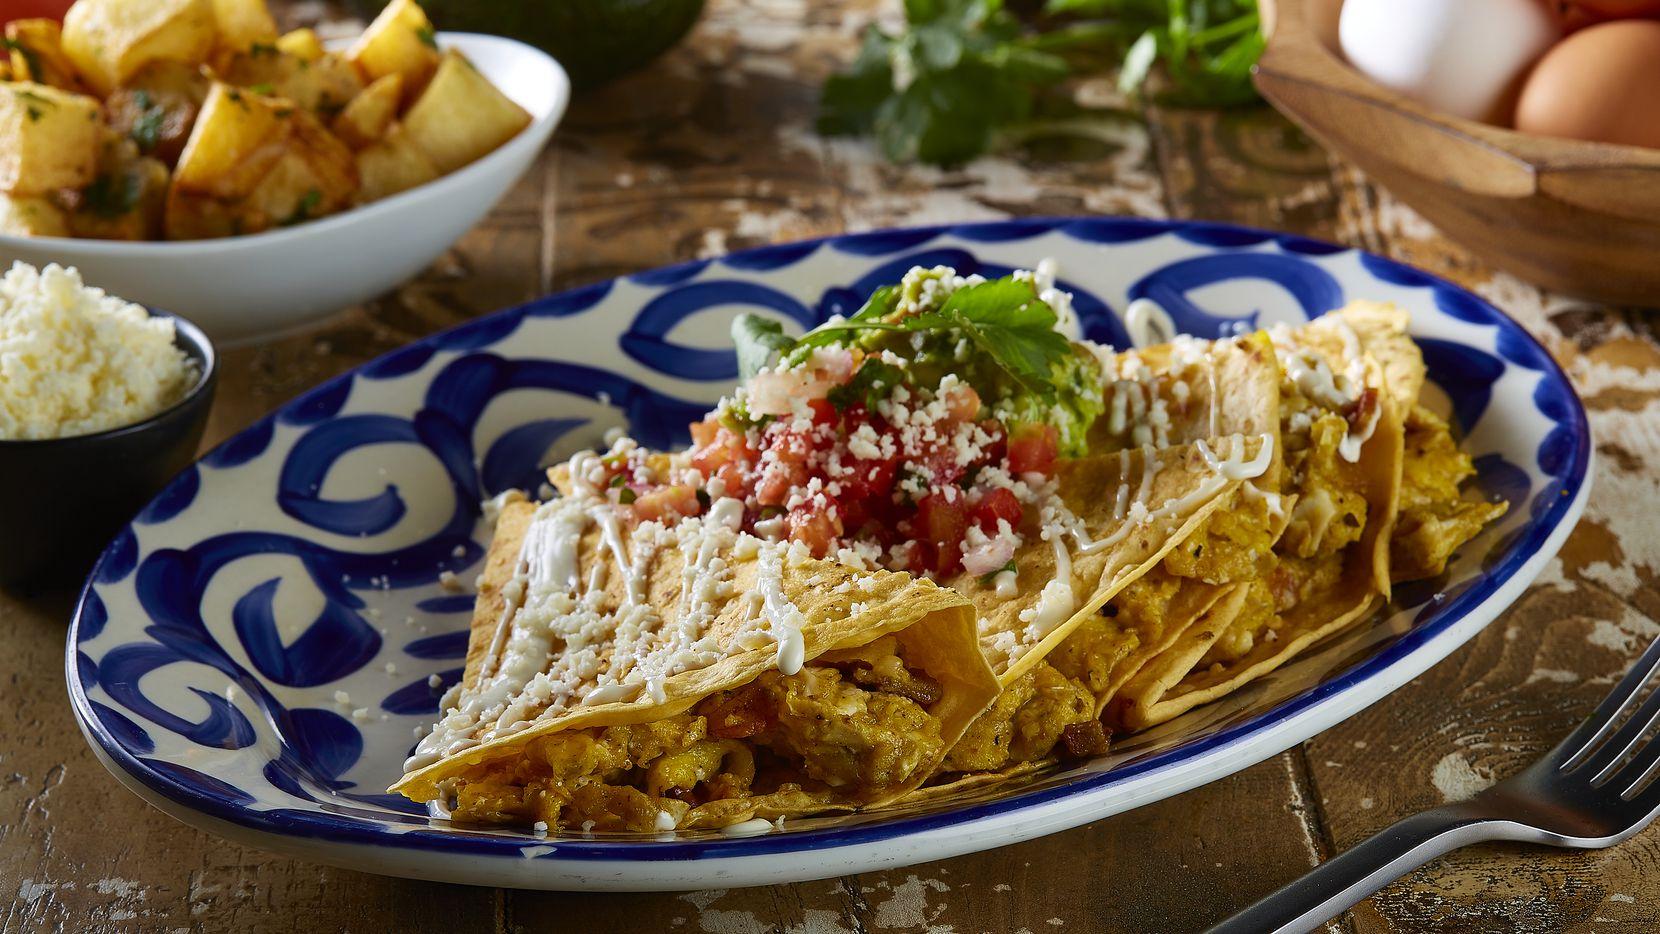 Unlike some Mexican restaurants in Dallas-Fort Worth, Mexican Sugar goes big on brunch. Here's the brunch quesadilla: scrambled eggs, bacon, cheese, guacamole, pico de gallo, Mexican crema and a jalapeno tortilla.